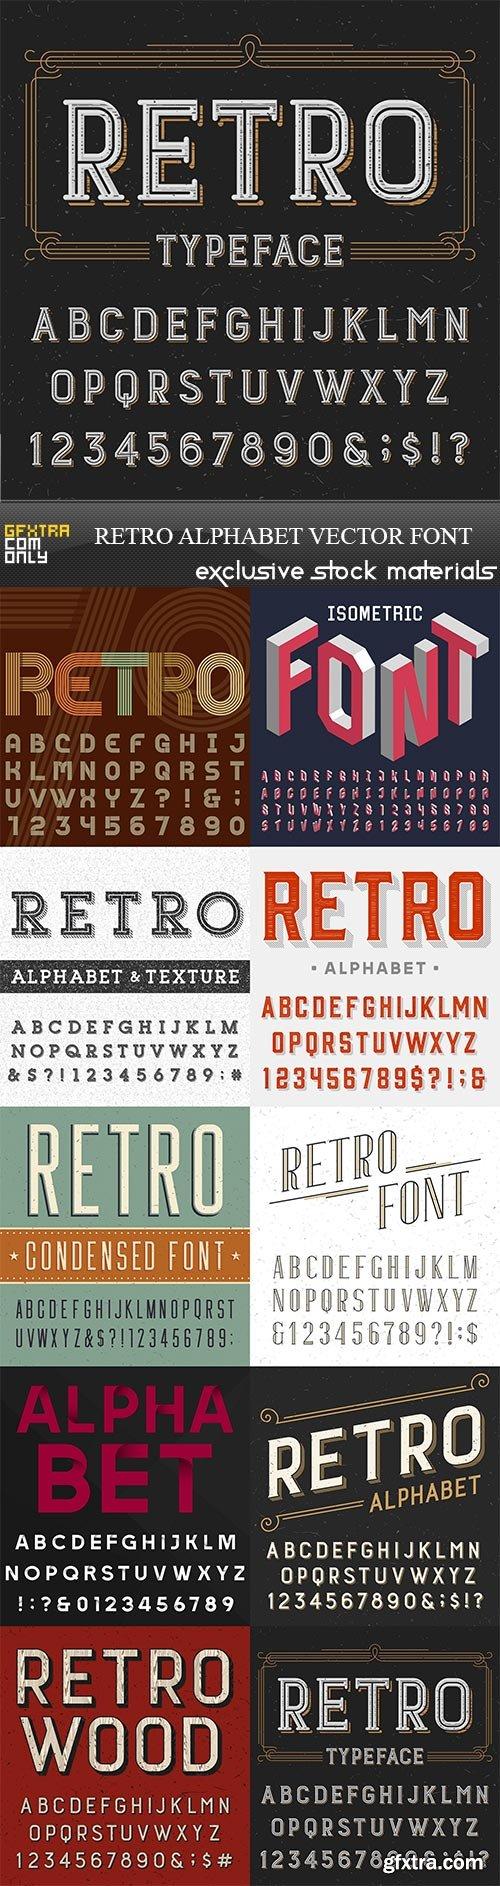 Retro alphabet vector font, 10 x EPS